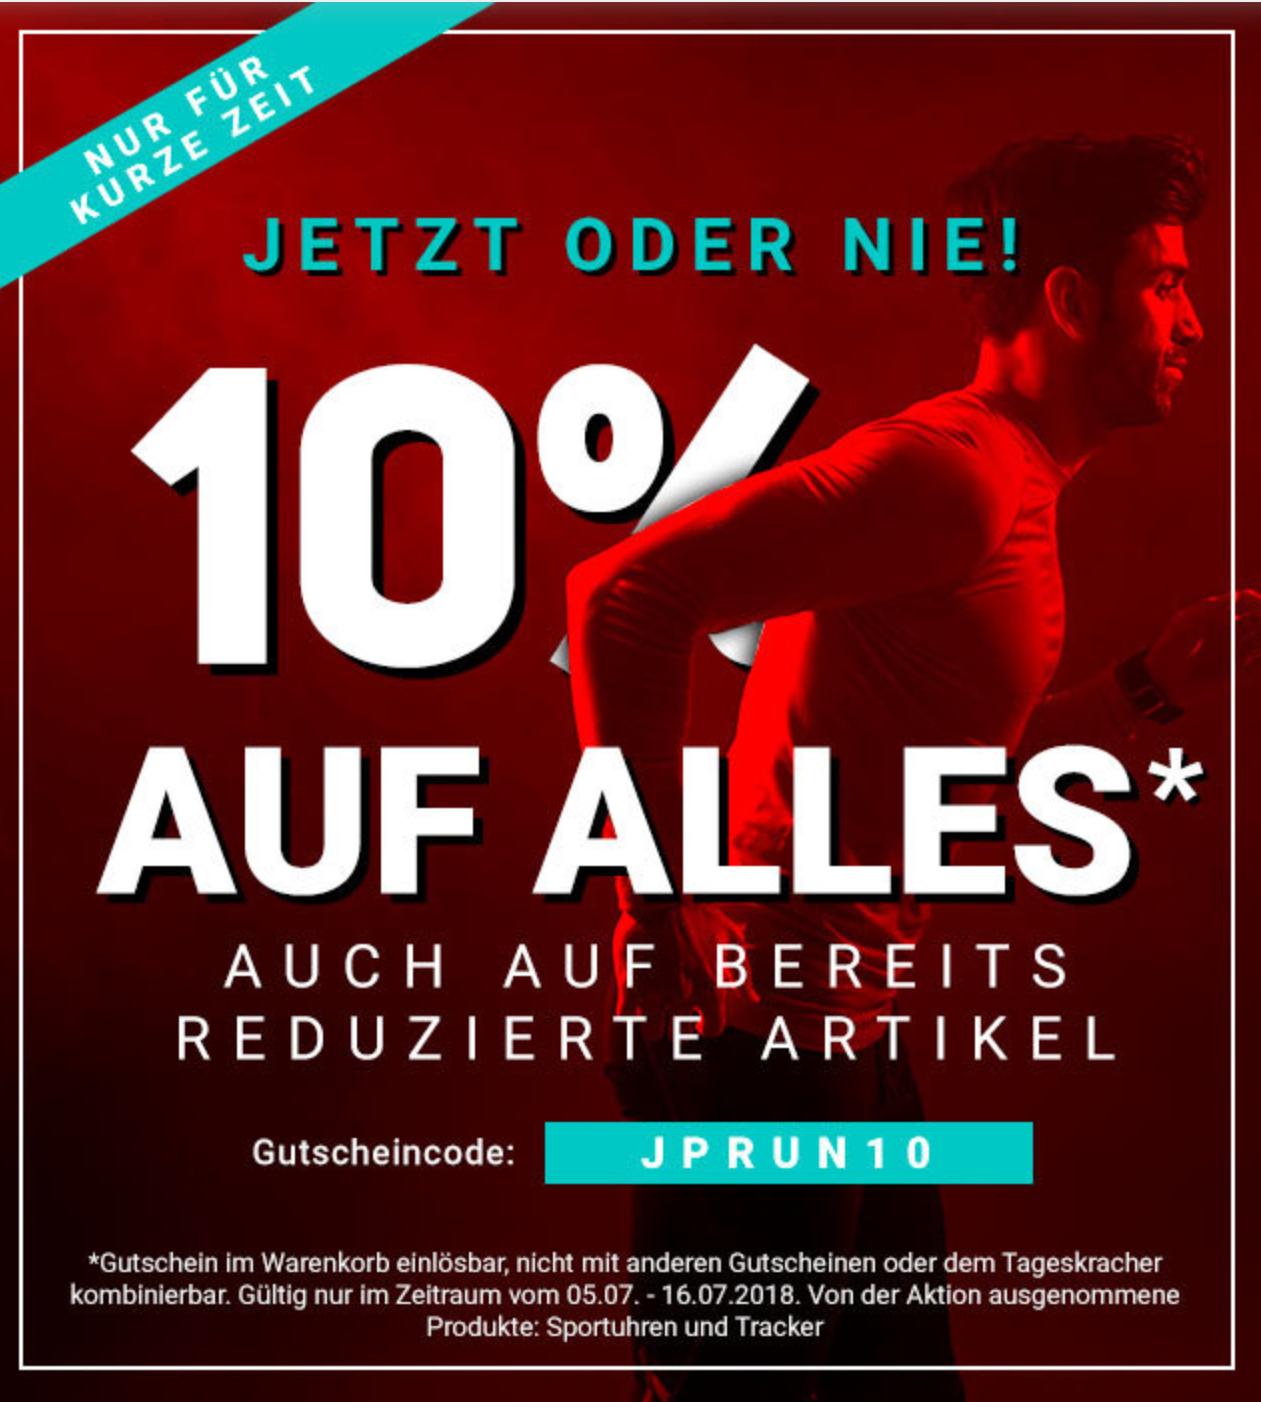 Jogging Point: 10% Rabatt auf ALLES inkl. Sale